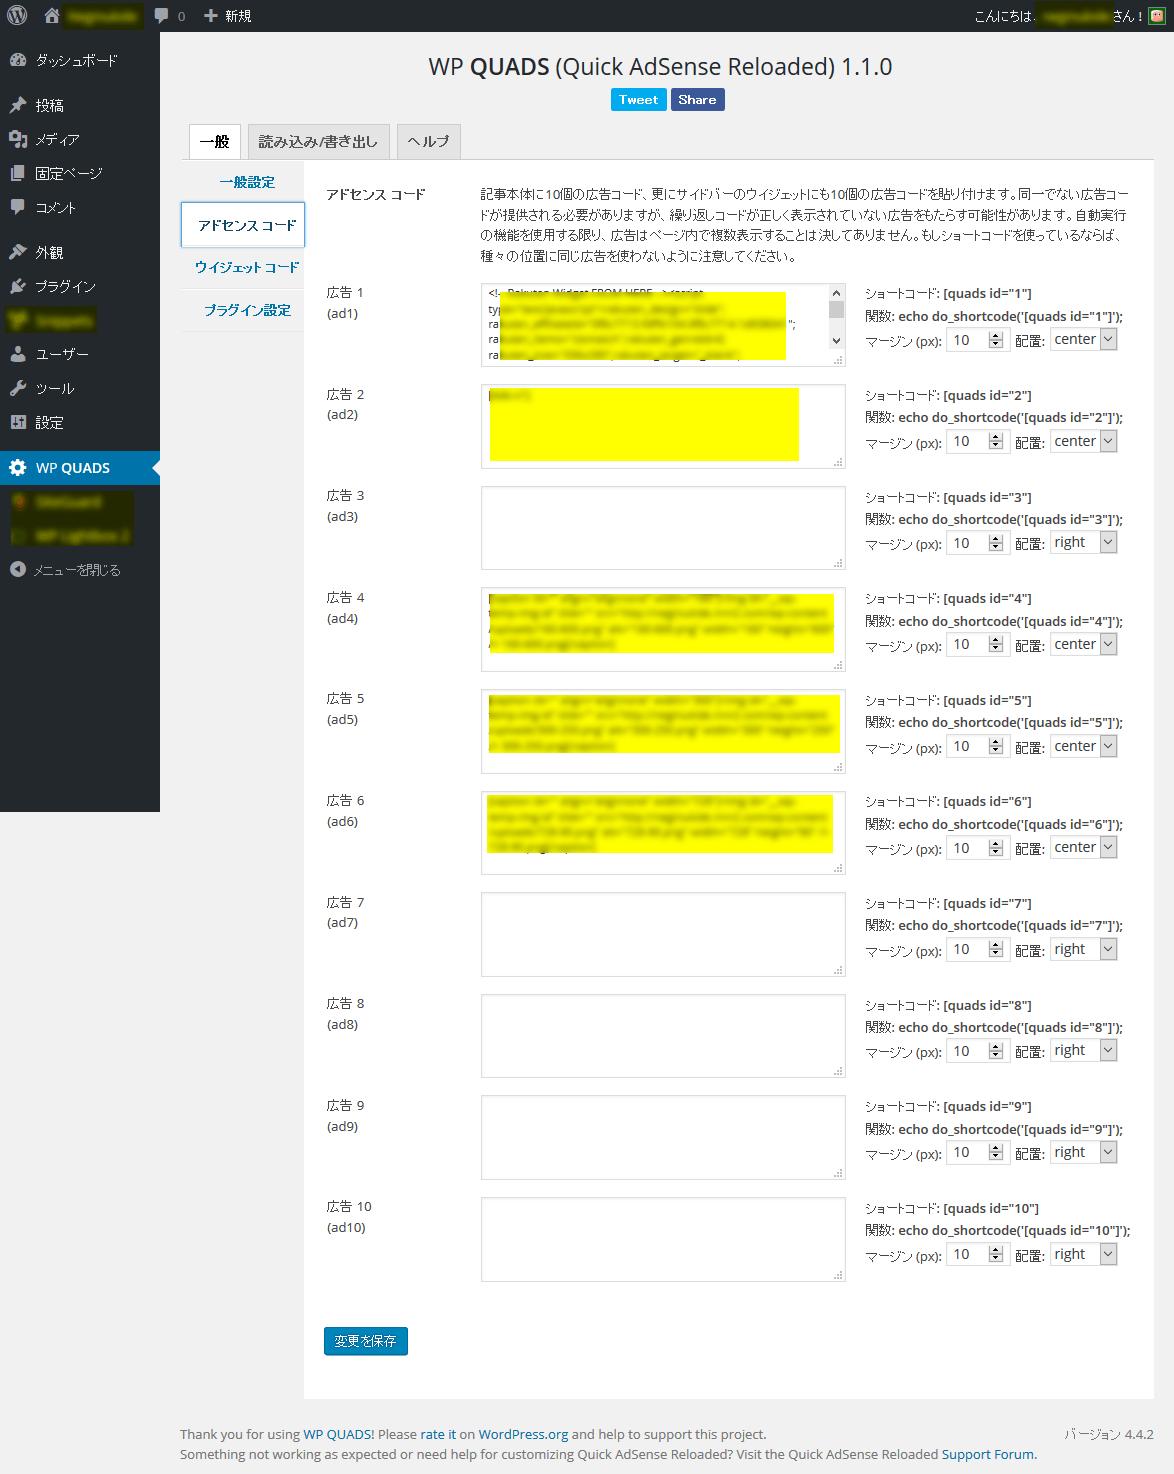 WP QUADS - Quick AdSense Reloaded プラグイン アドセンスコード